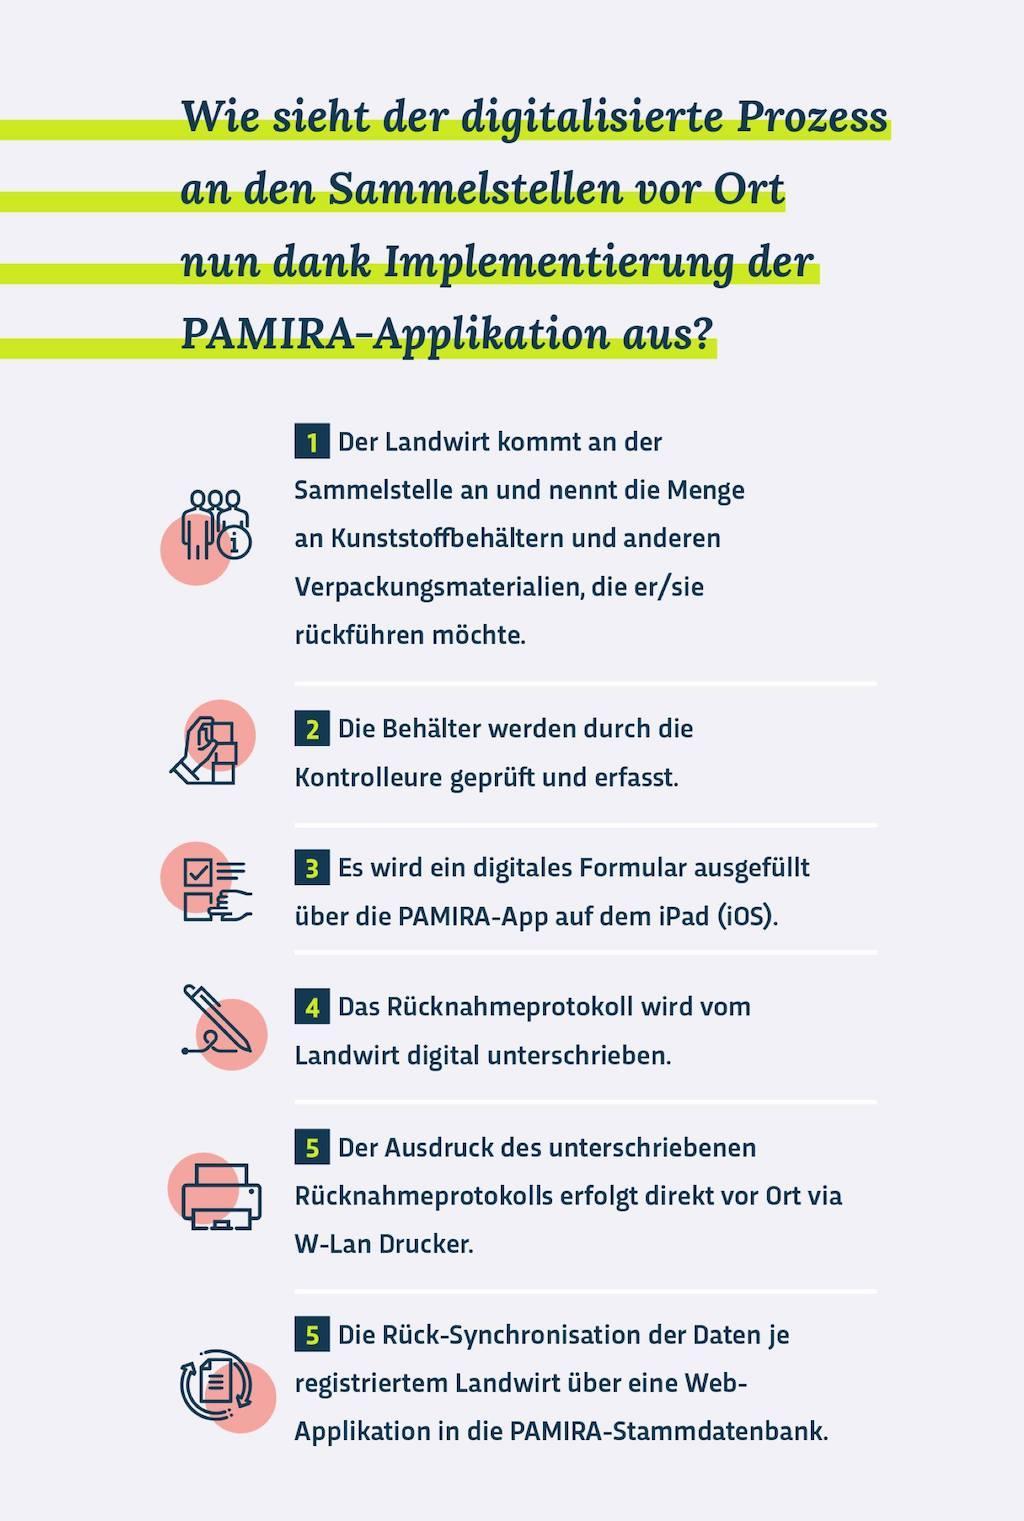 Digitalisierter-PAMIRA-Prozess